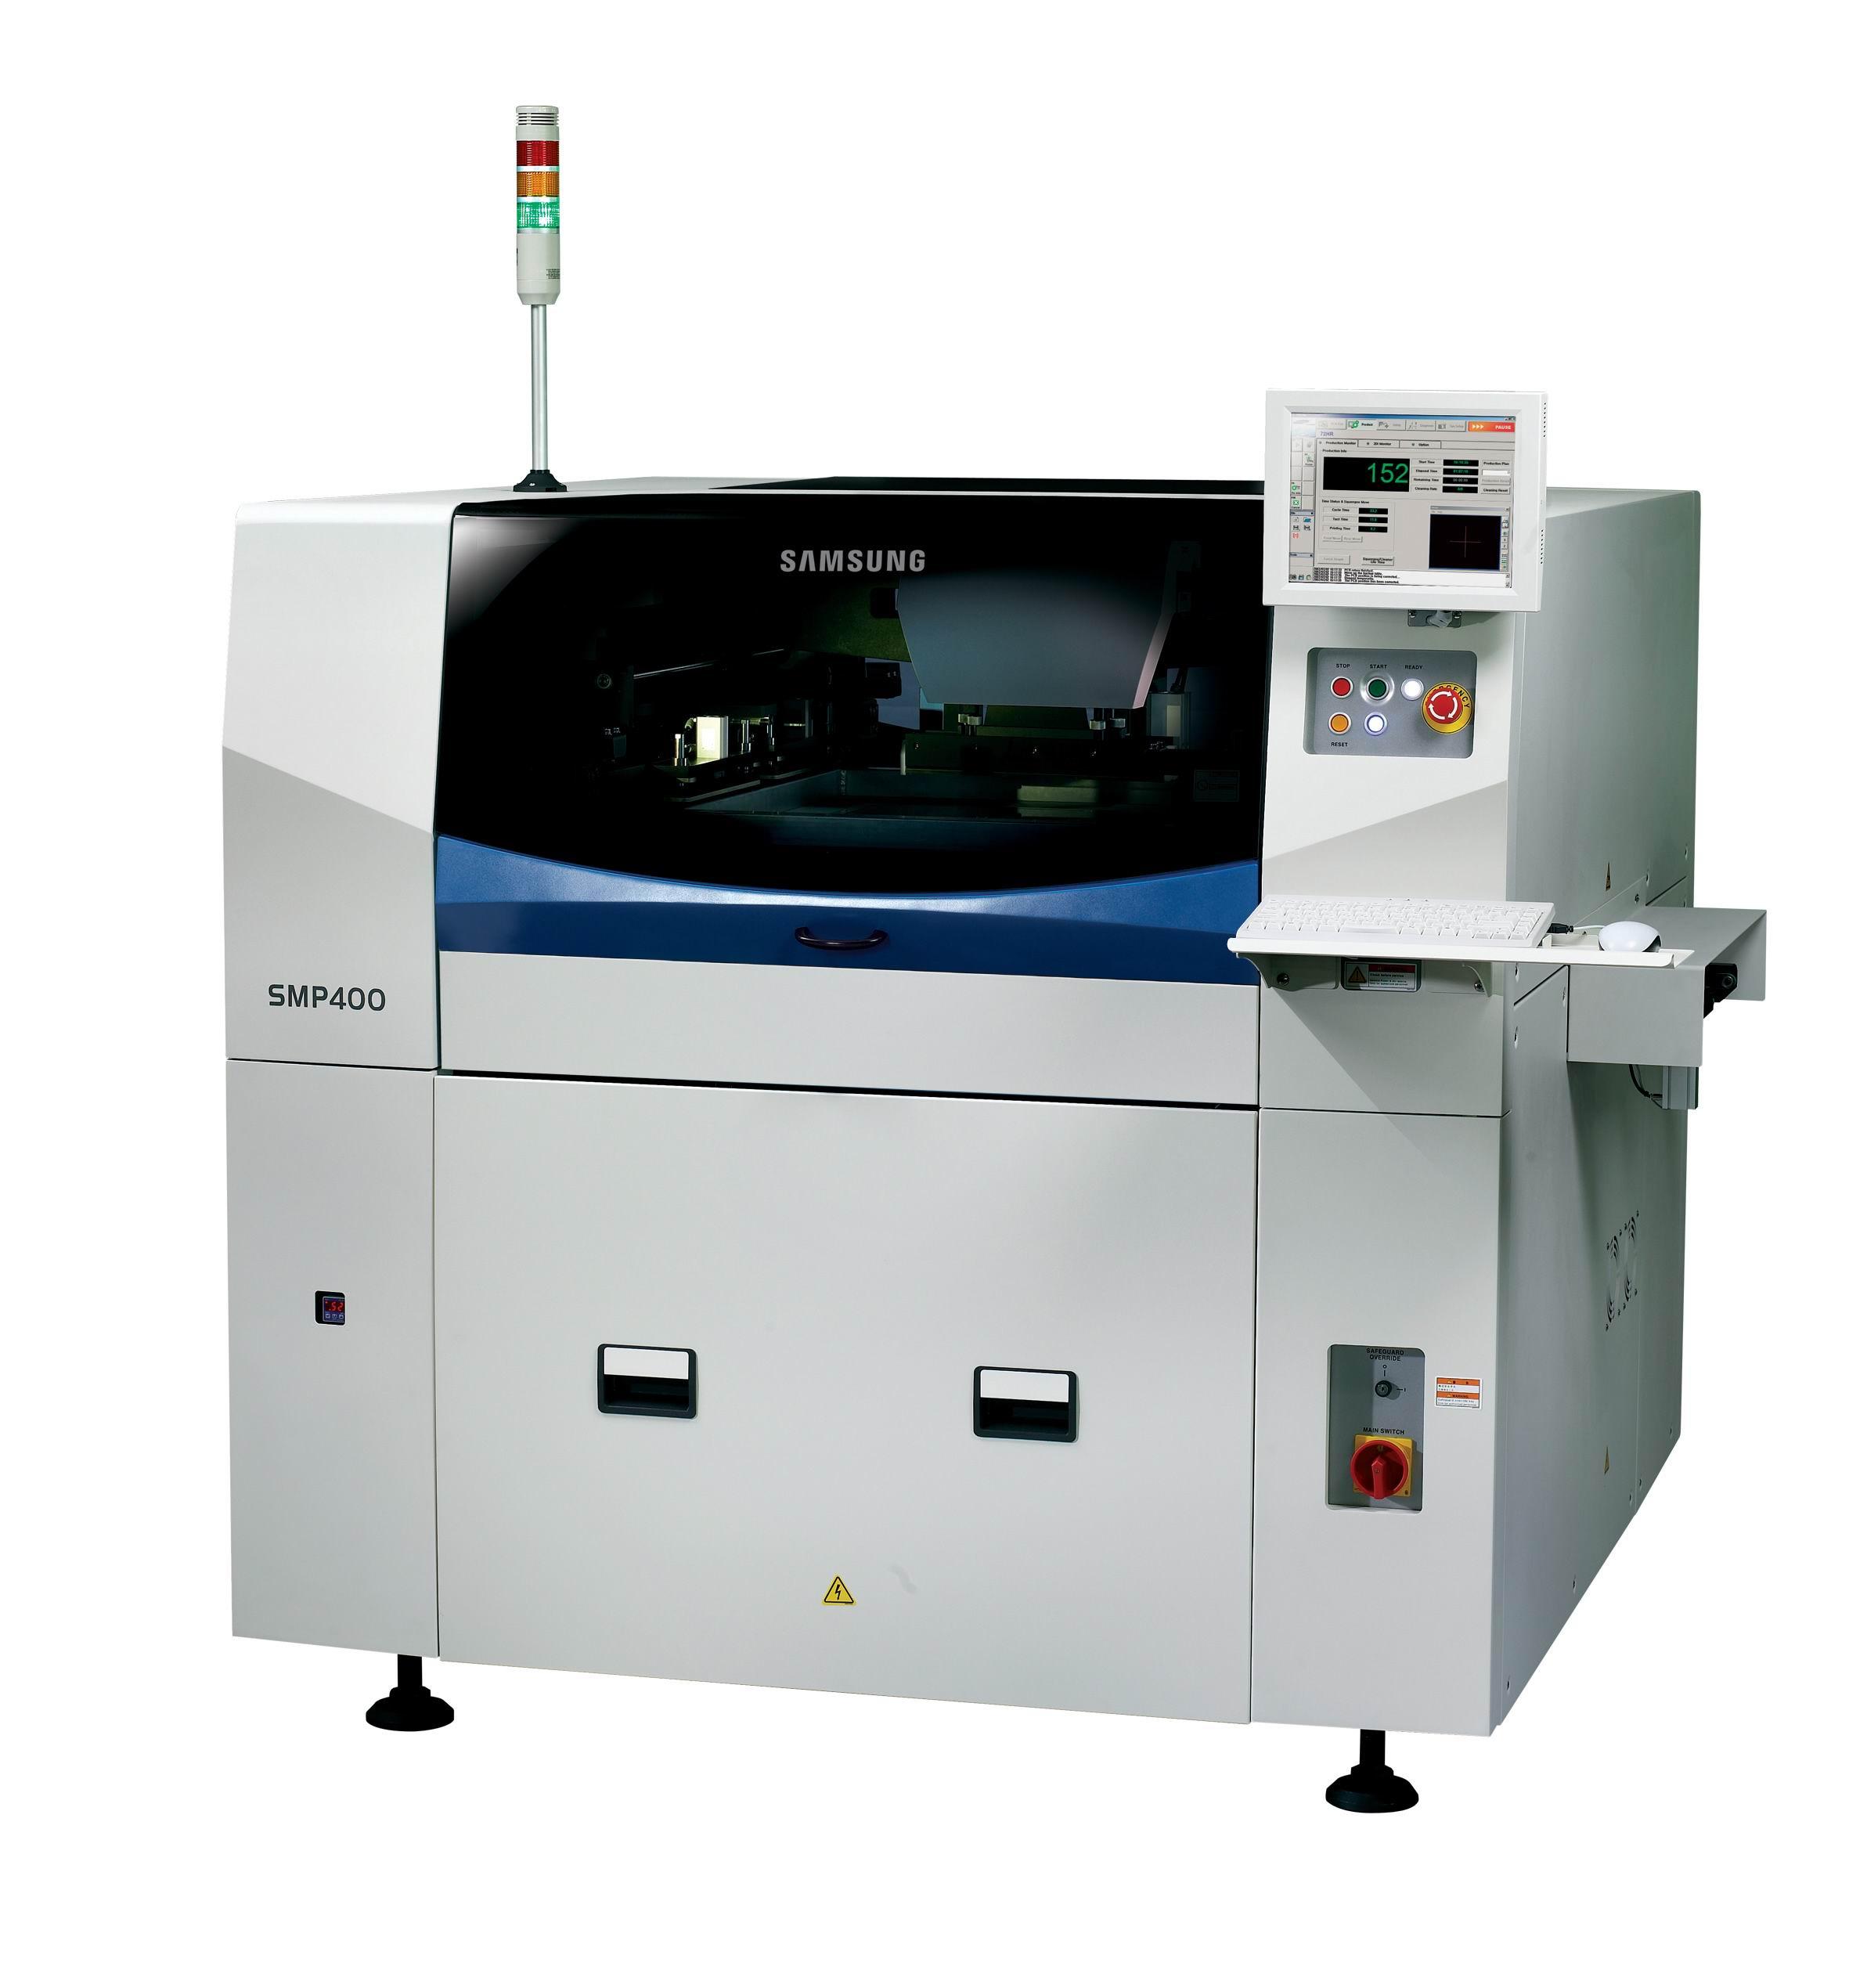 SMT全自动锡膏印刷机同步带.